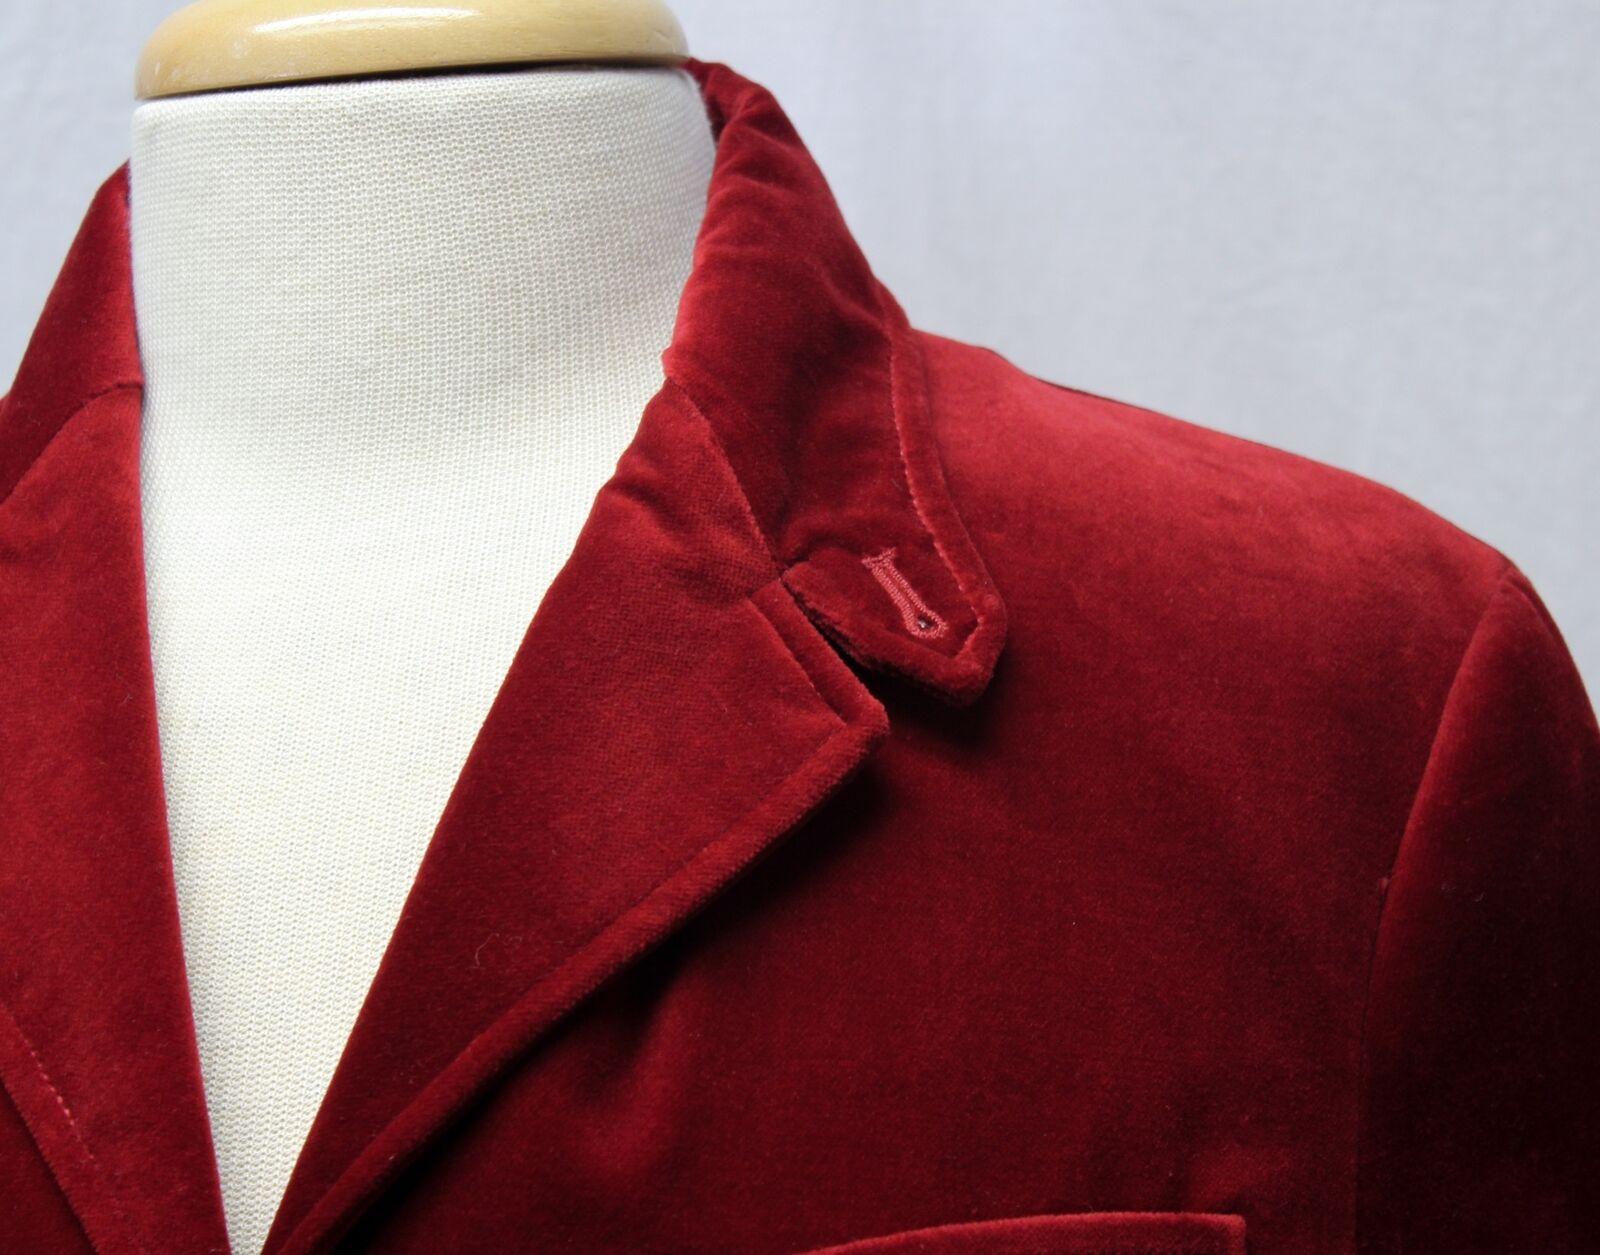 Ralph Lauren Red Velvet Blazer Jacket Size 10 - image 4